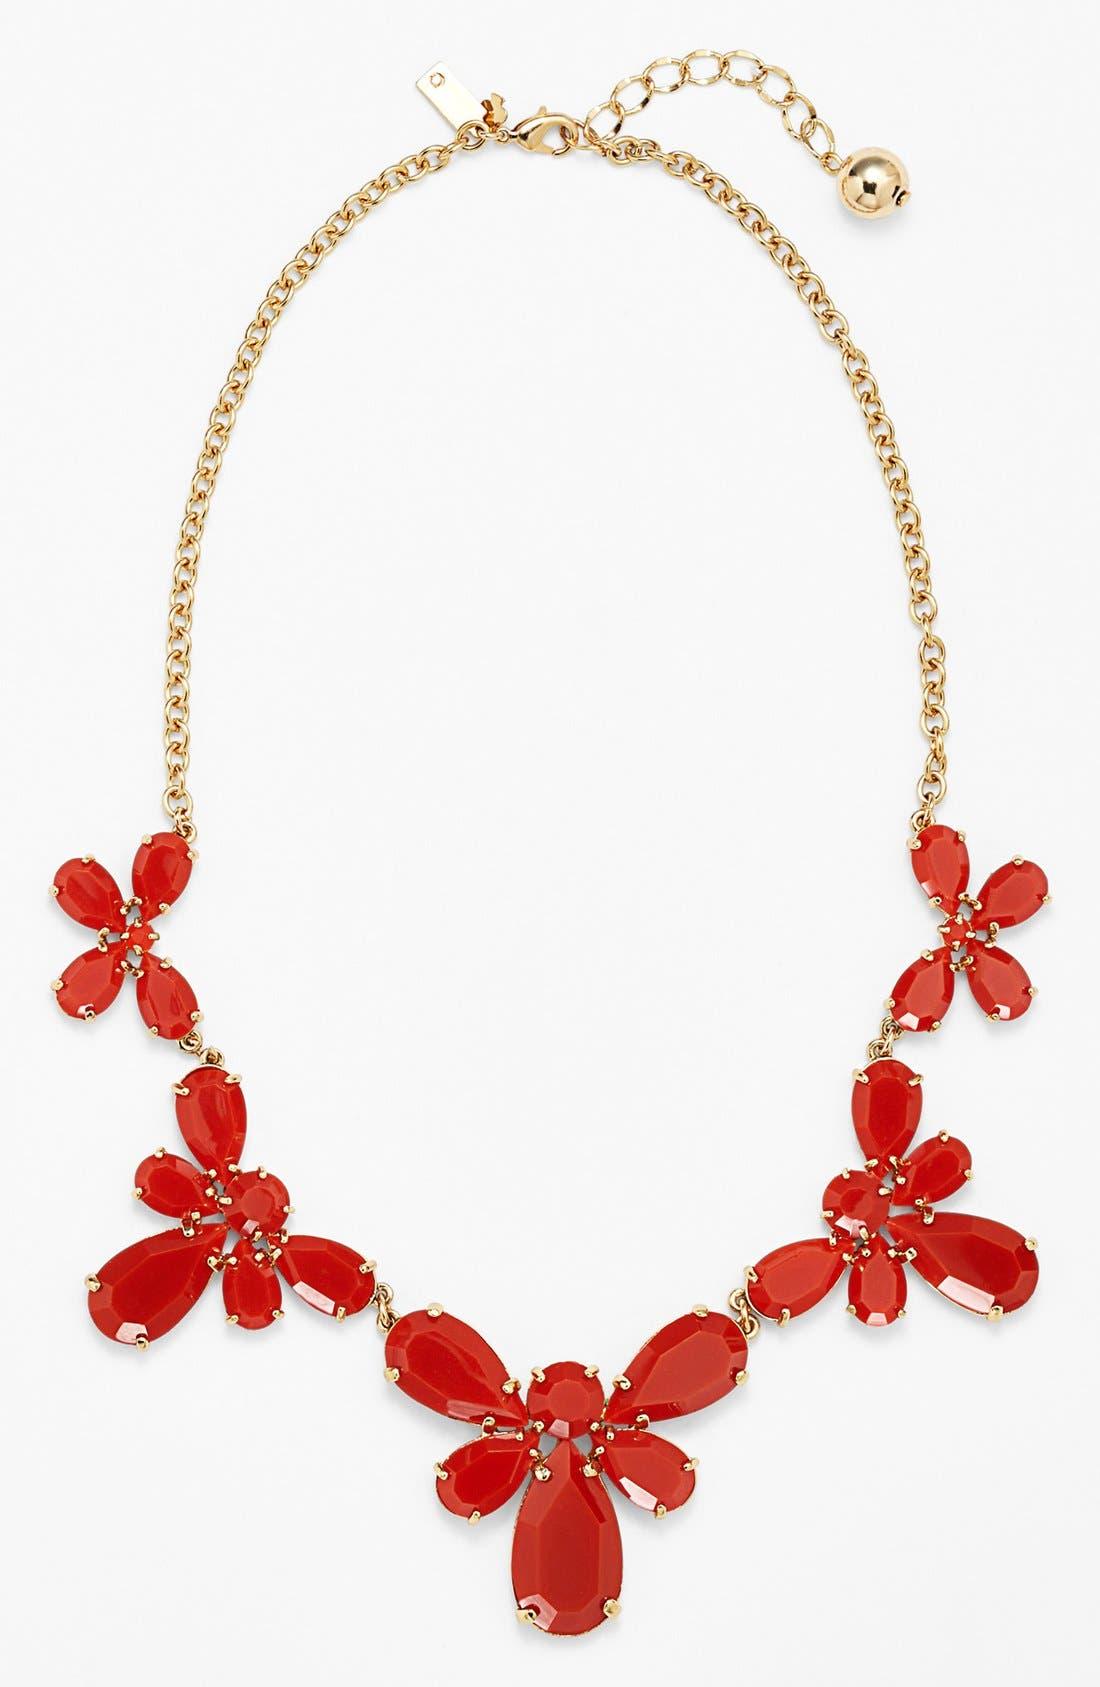 Main Image - kate spade new york 'garden path' graduated collar necklace